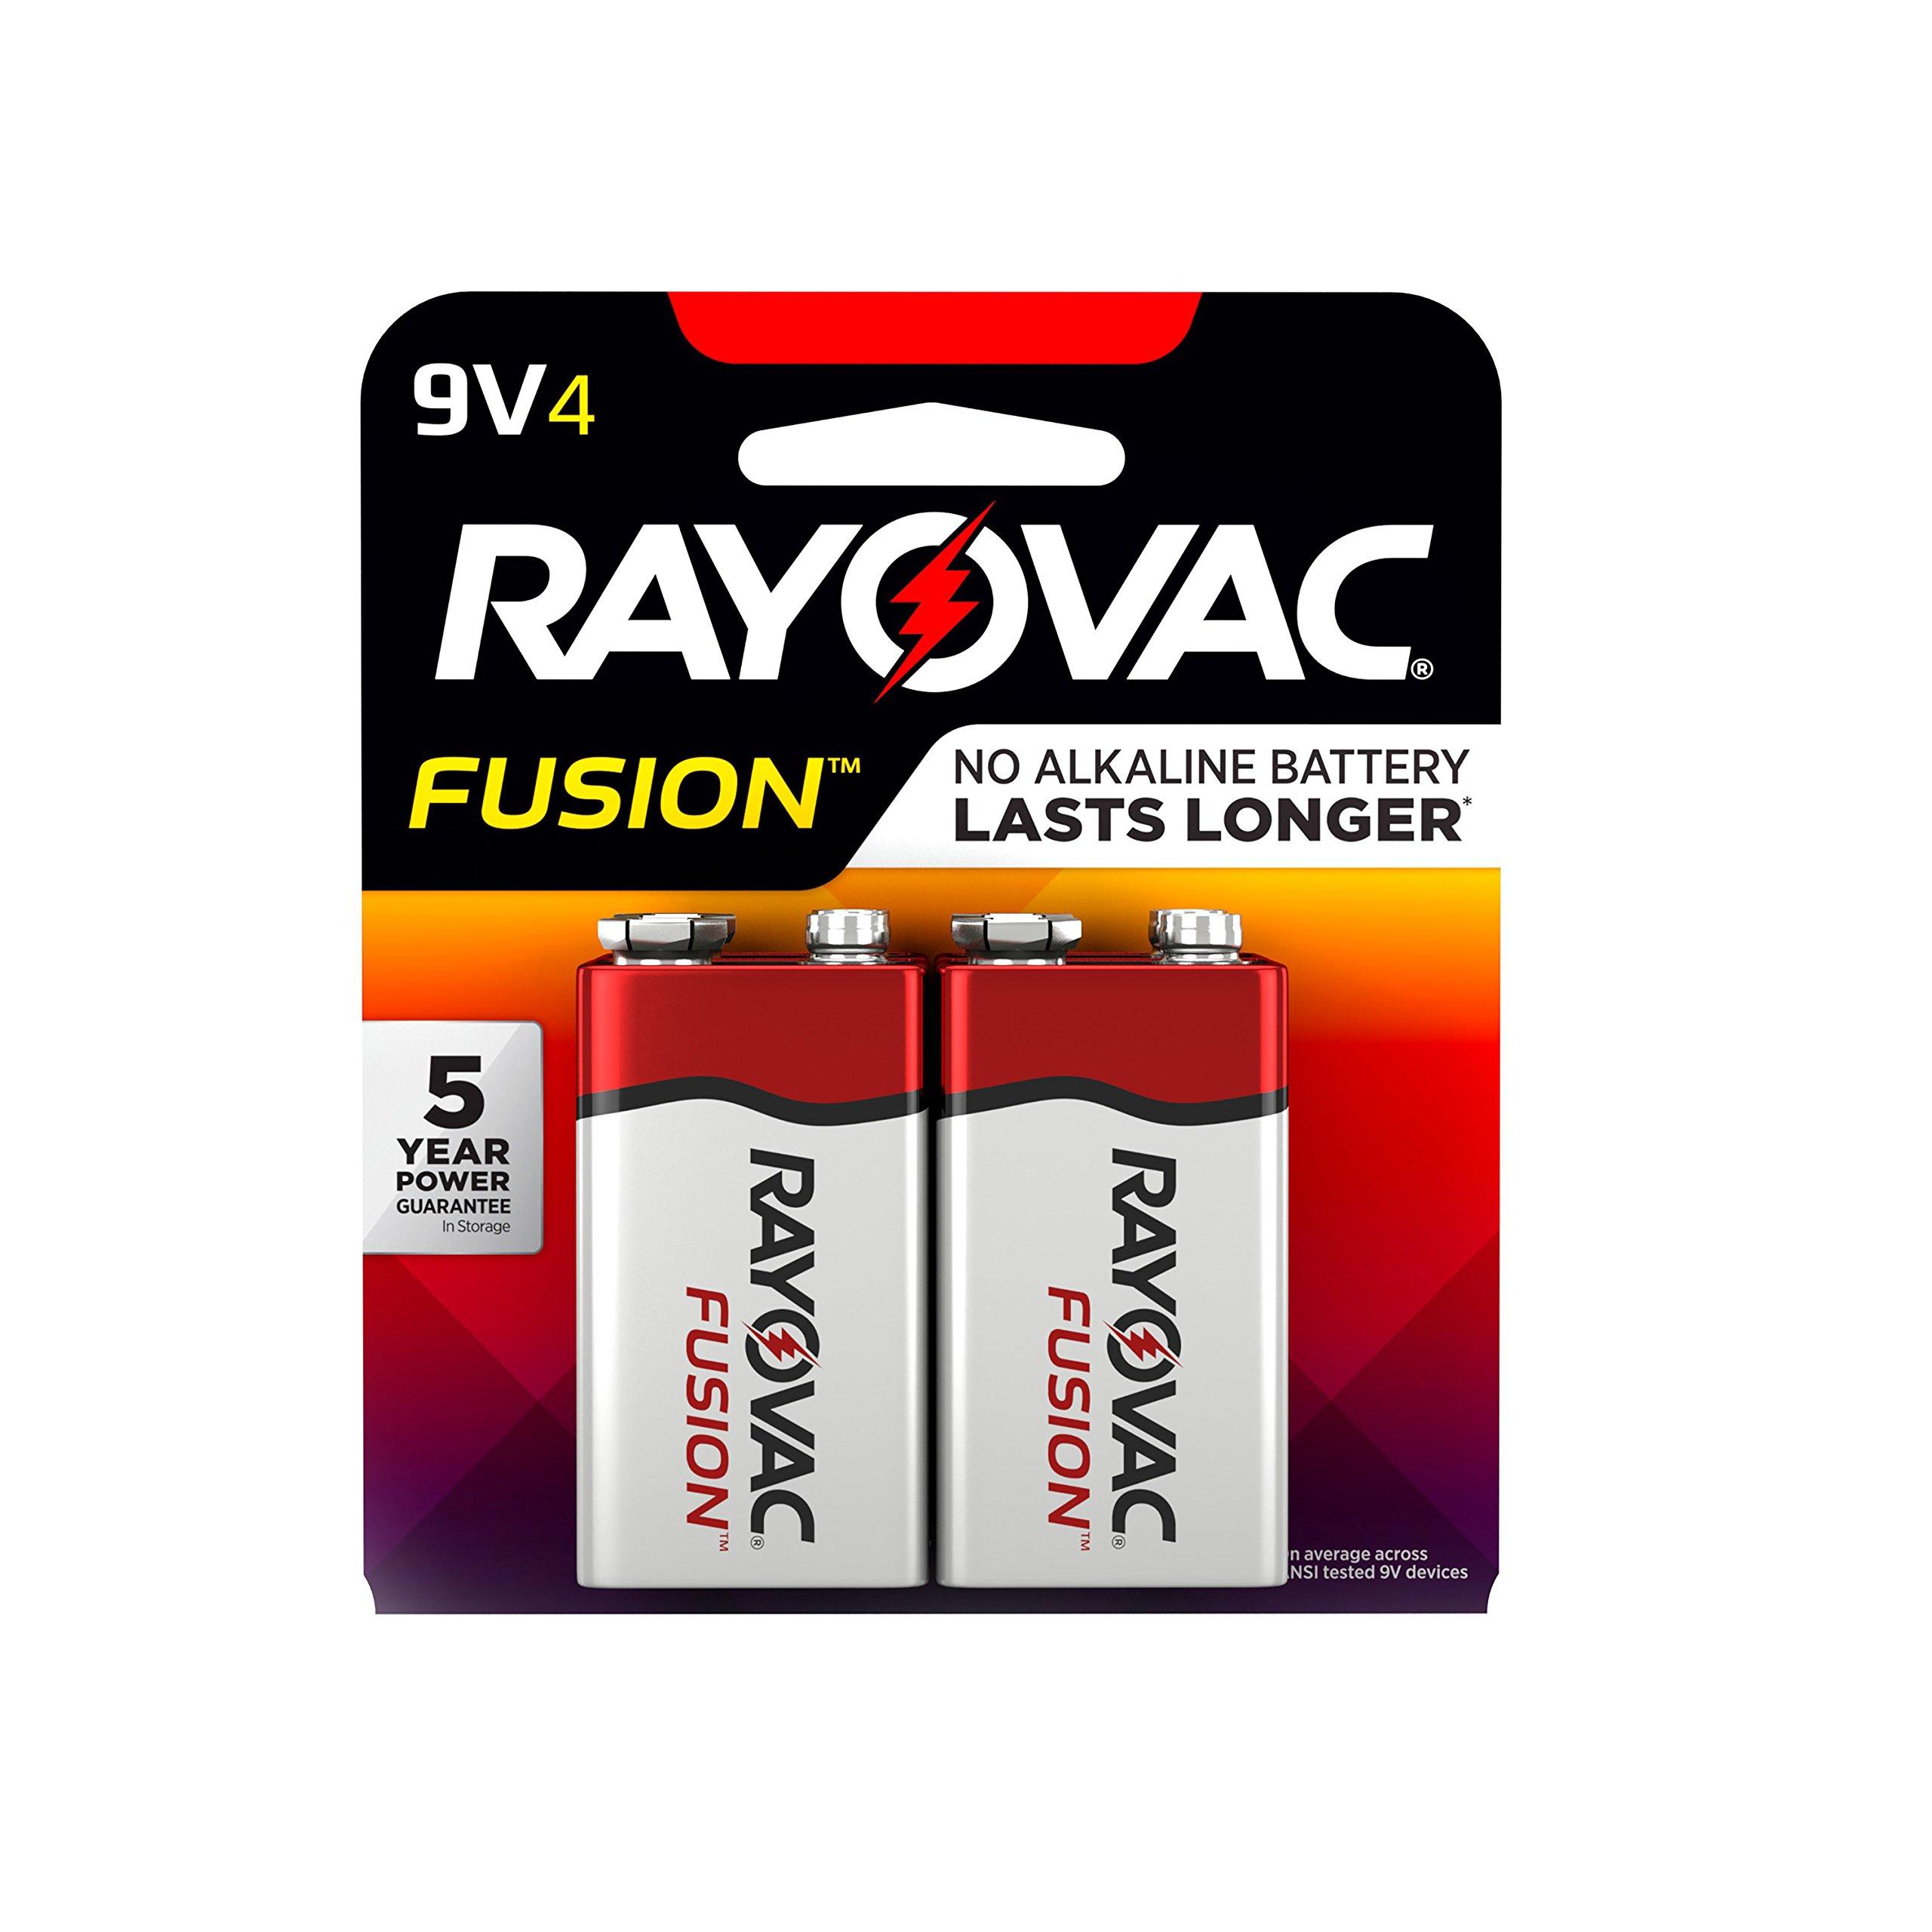 RAYOVAC 9V 4-Pack FUSION Premium Alkaline Batteries, A1604-4TFUSK